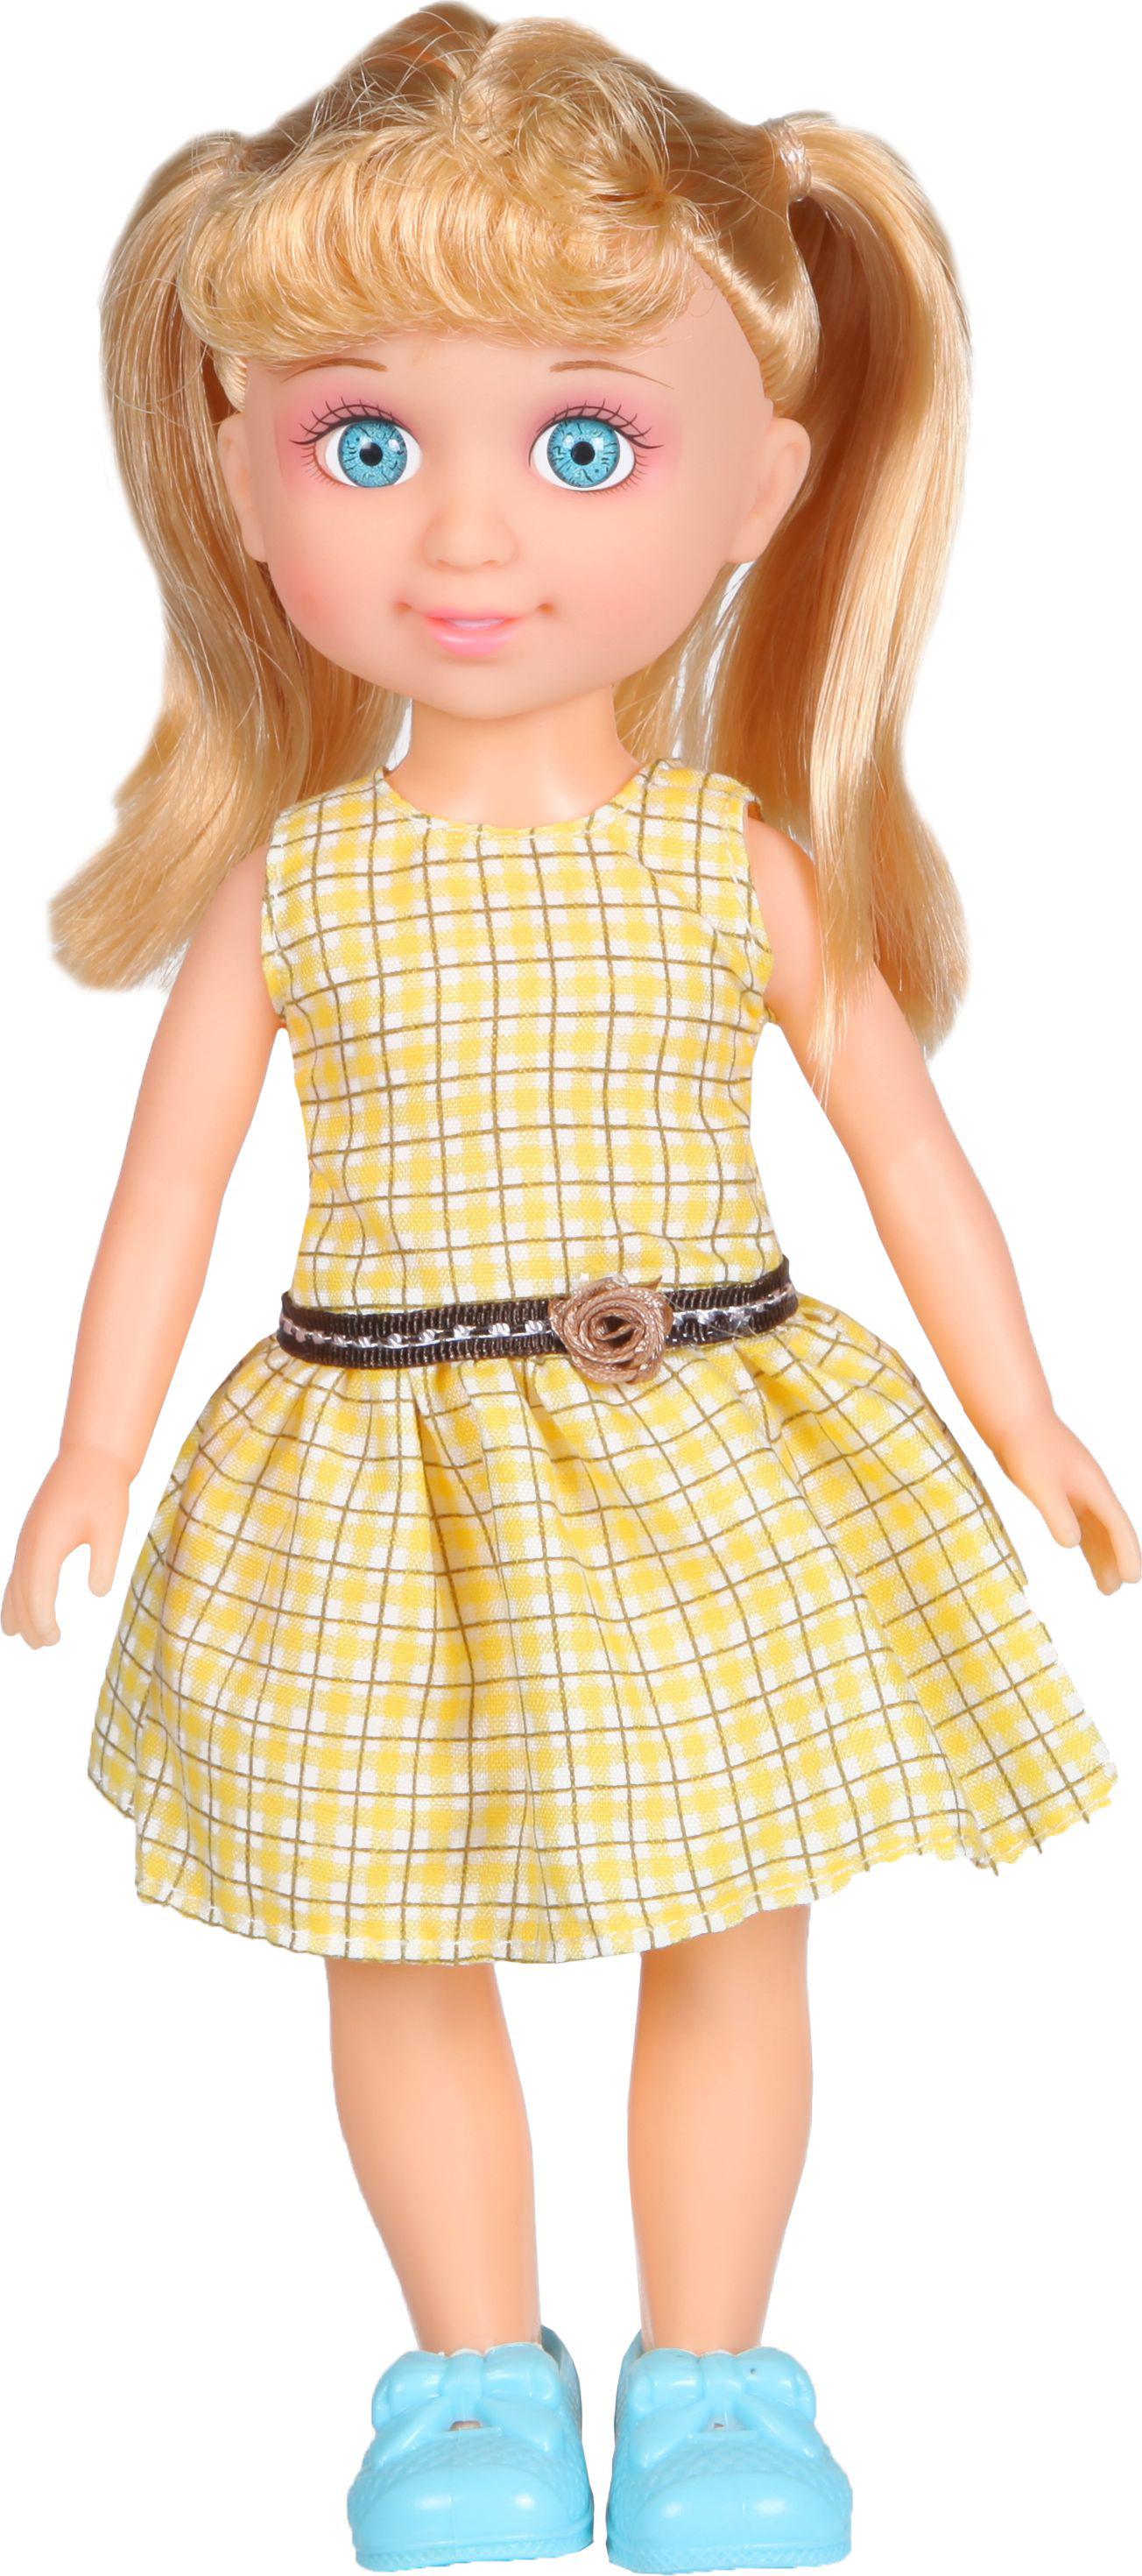 Yako Кукла Jammy блондинка M6295 куклы bonna кукла jammy 25 см невеста